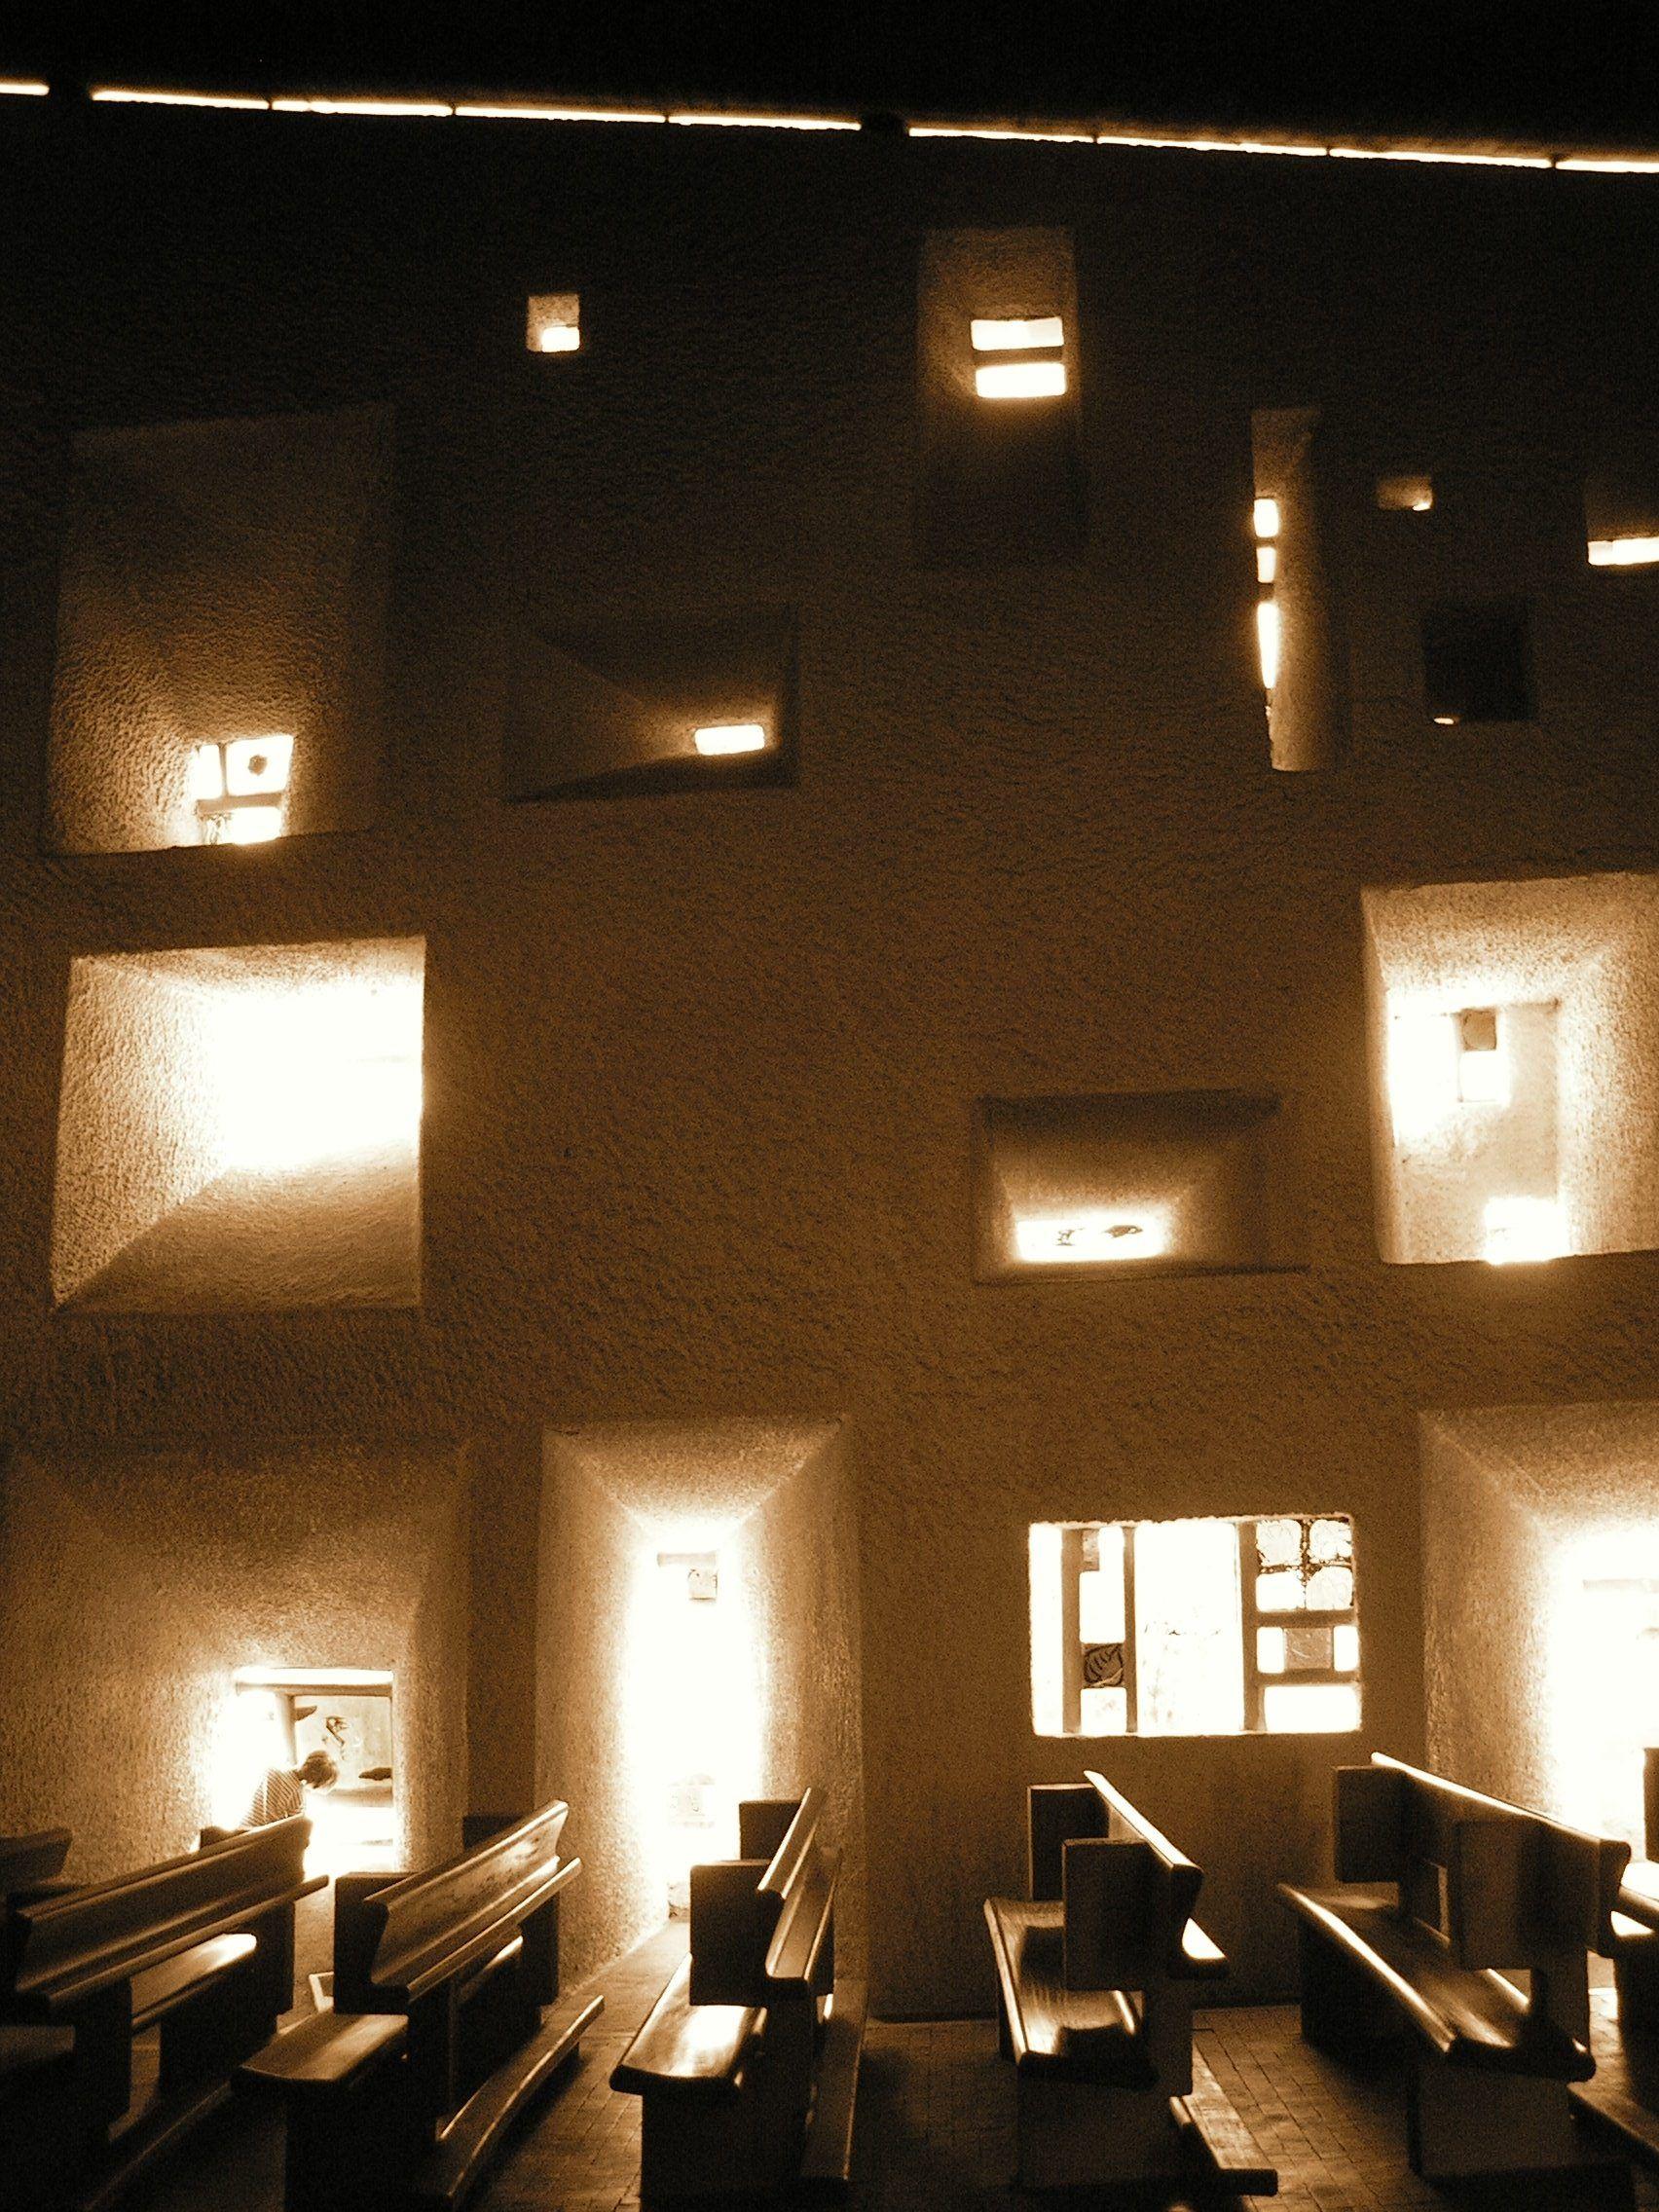 le corbusier notre dame du haut ronchamp france archit kton f r baukunst. Black Bedroom Furniture Sets. Home Design Ideas